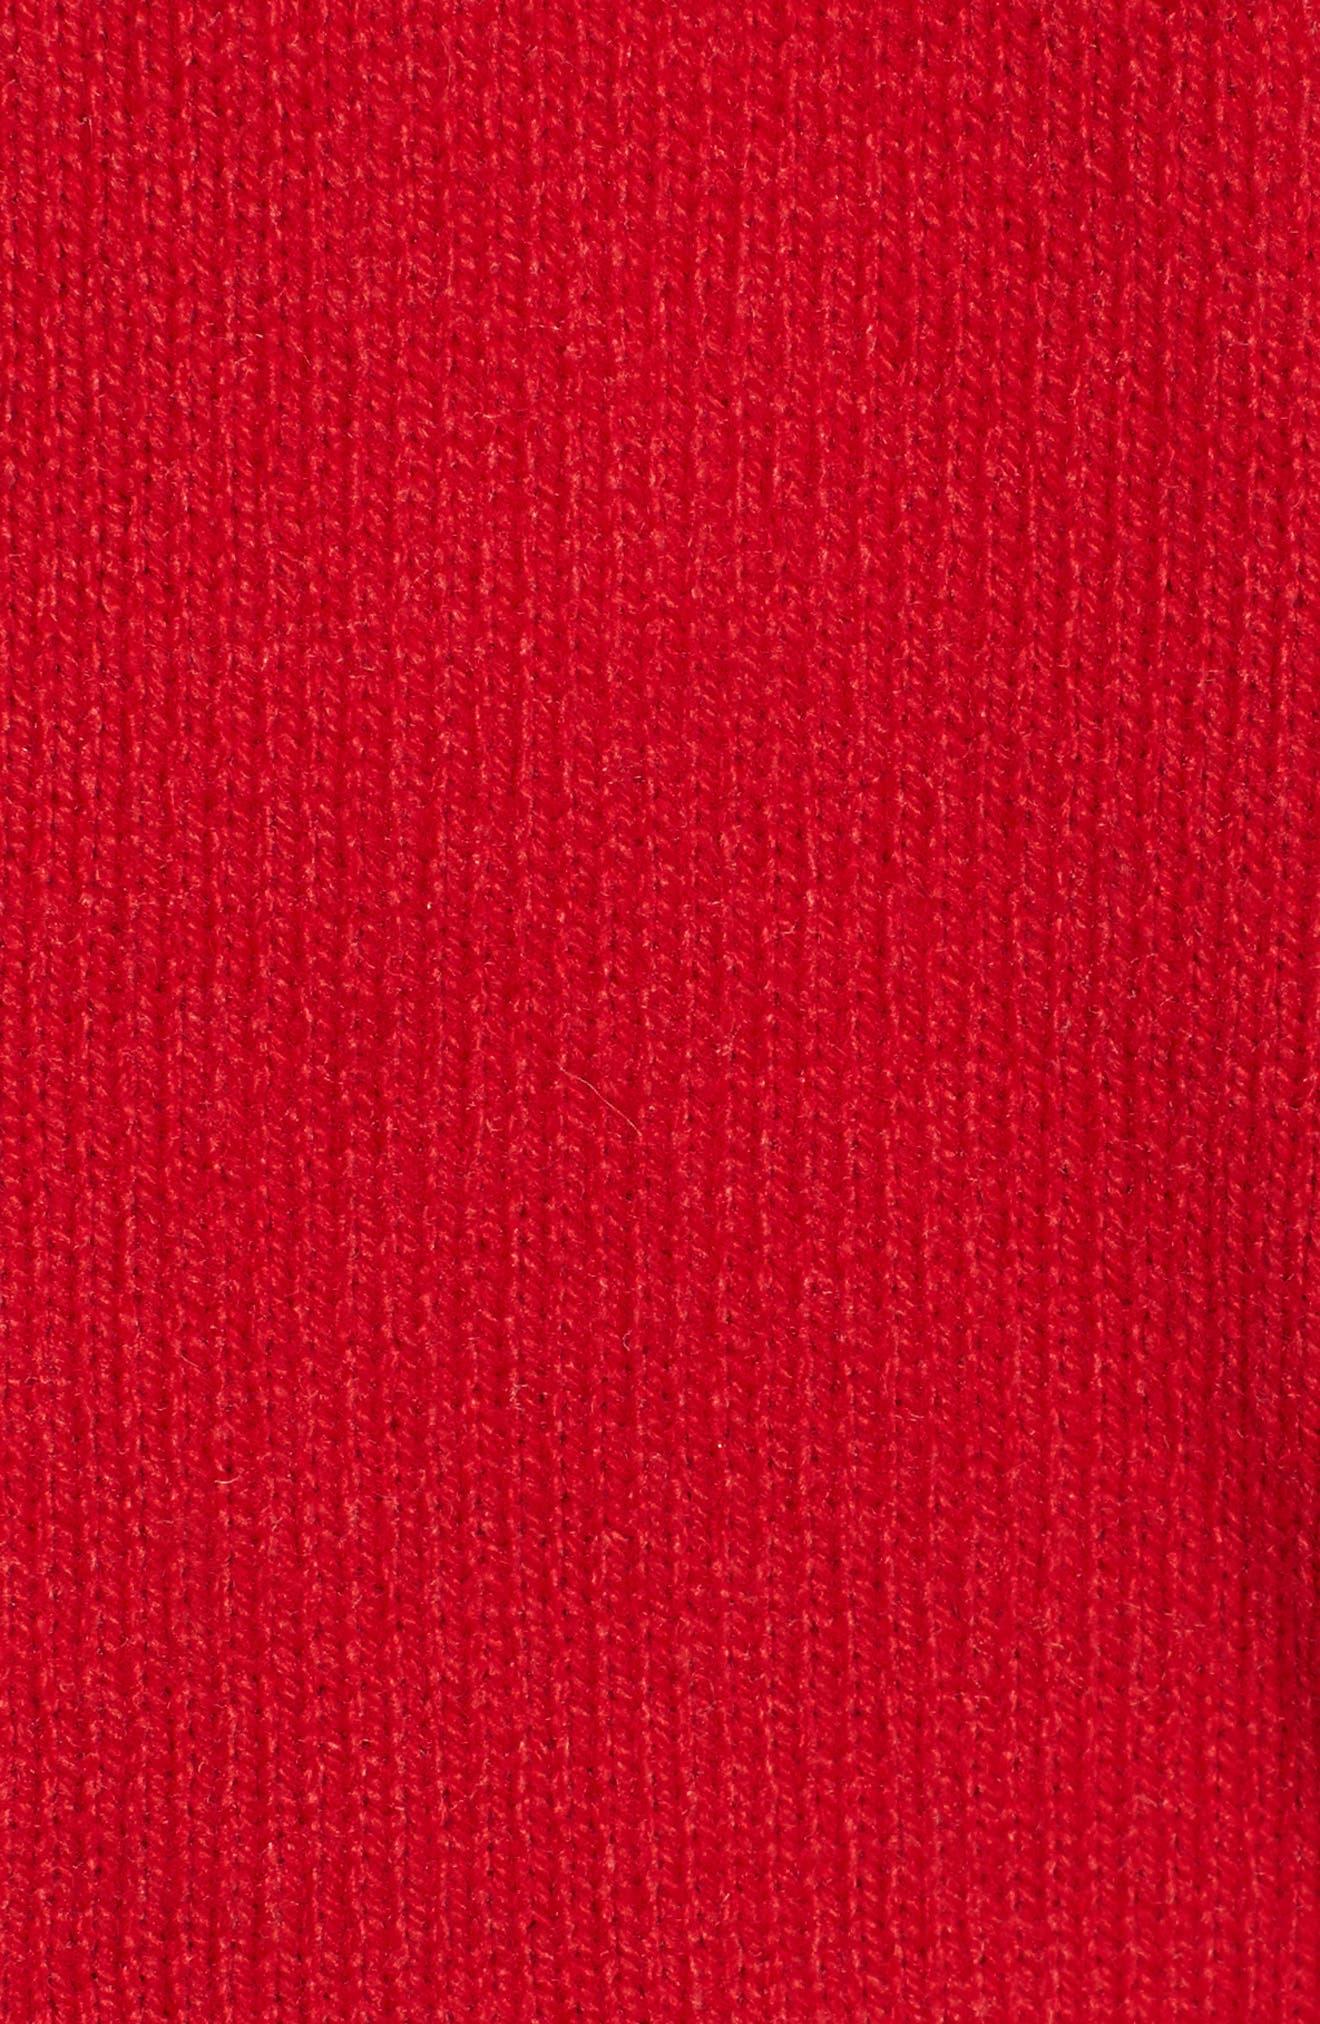 Preppy V-Neck Cardigan,                             Alternate thumbnail 5, color,                             Red- Navy Combo